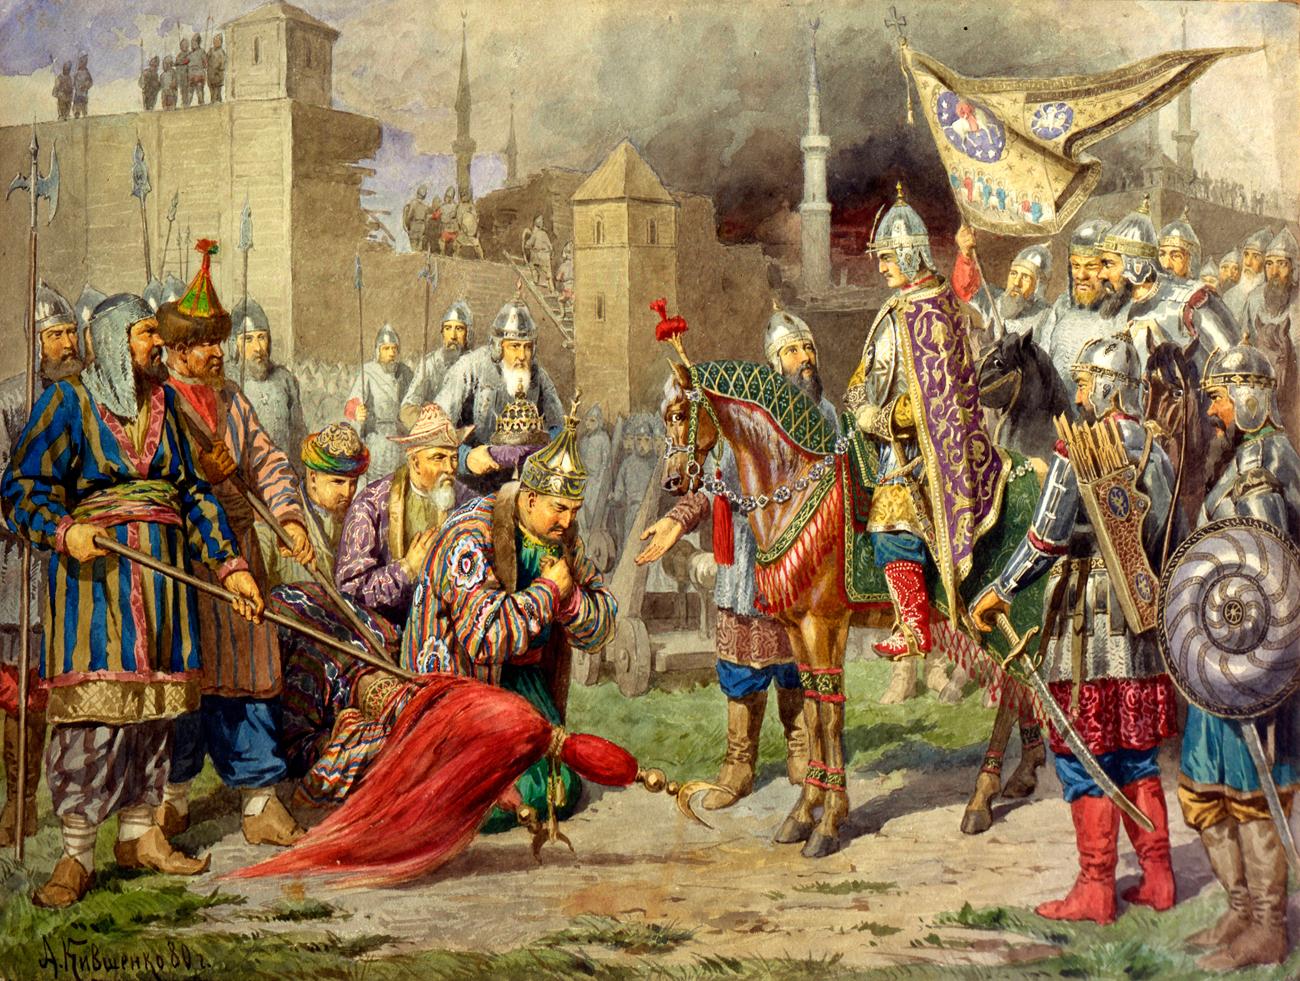 tsar_ivan_iv_conquering_kazan_gettyimages-464428259_b.jpg